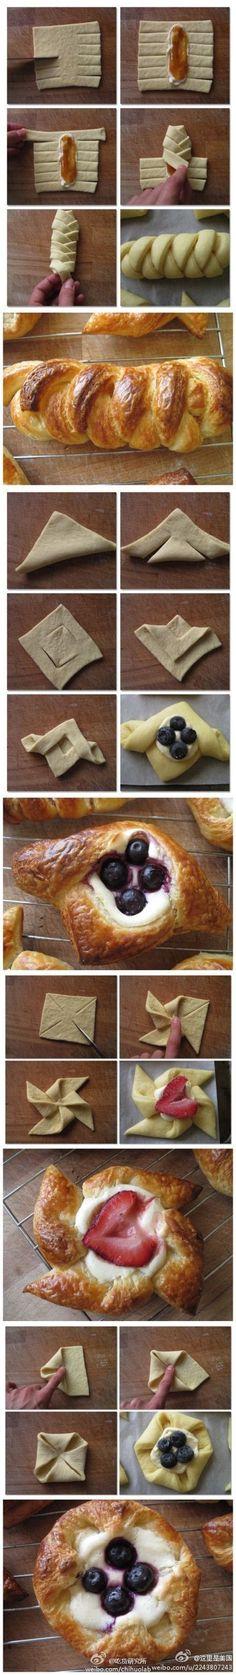 Pastry folding 101 - Imgur